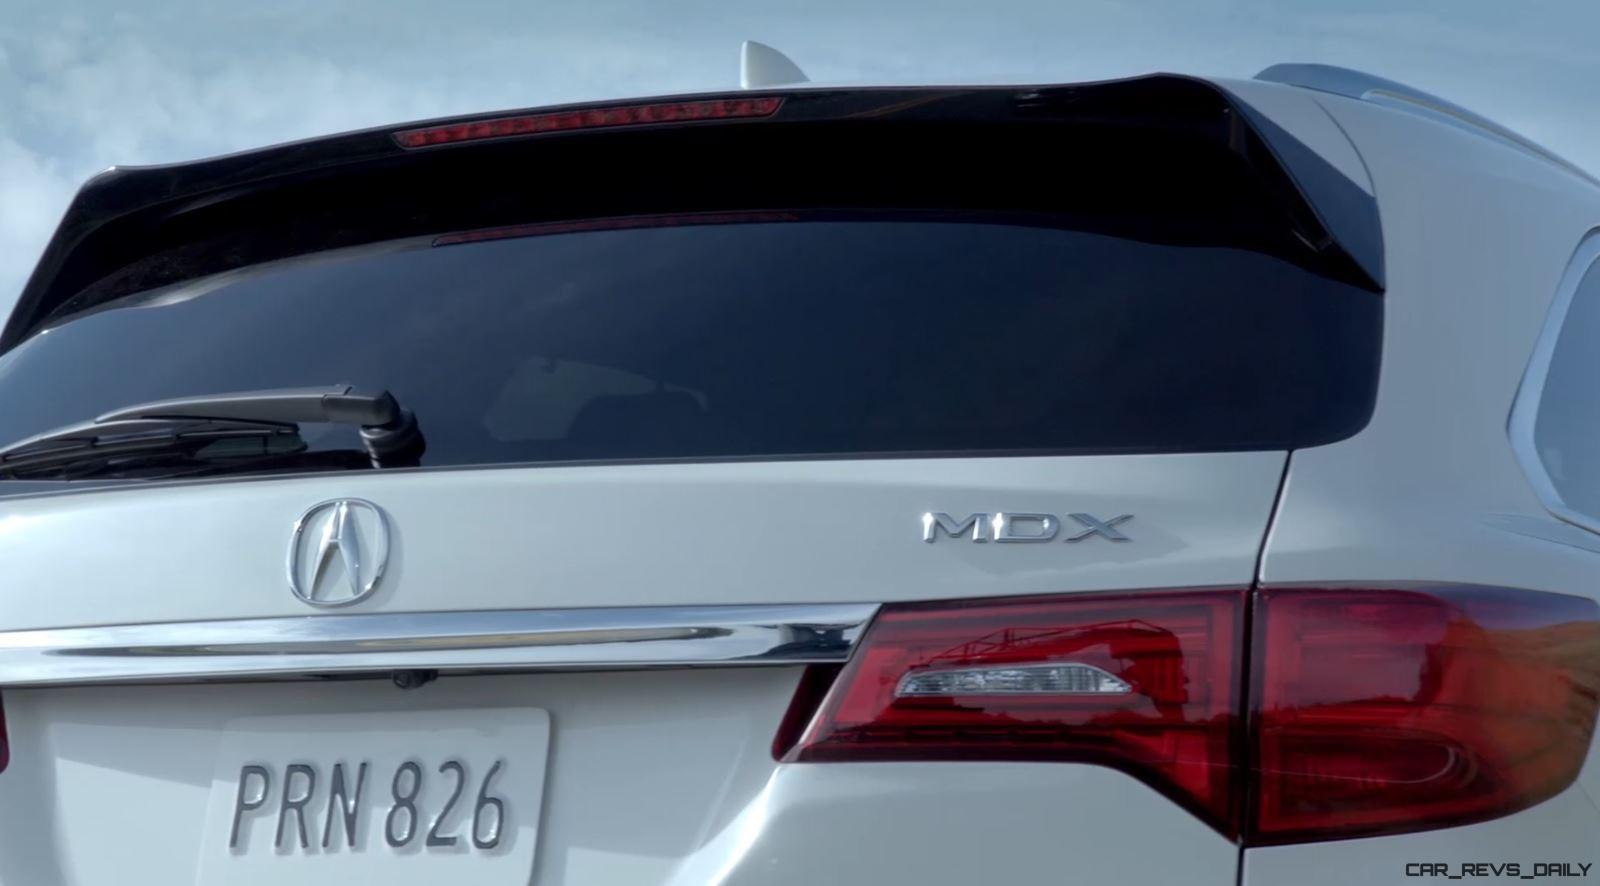 3000gt Interior Fuse Box Diagram Not Lossing Wiring 1994 Mitsubishi 2015 Acura Mdx Diagrams Engine 97